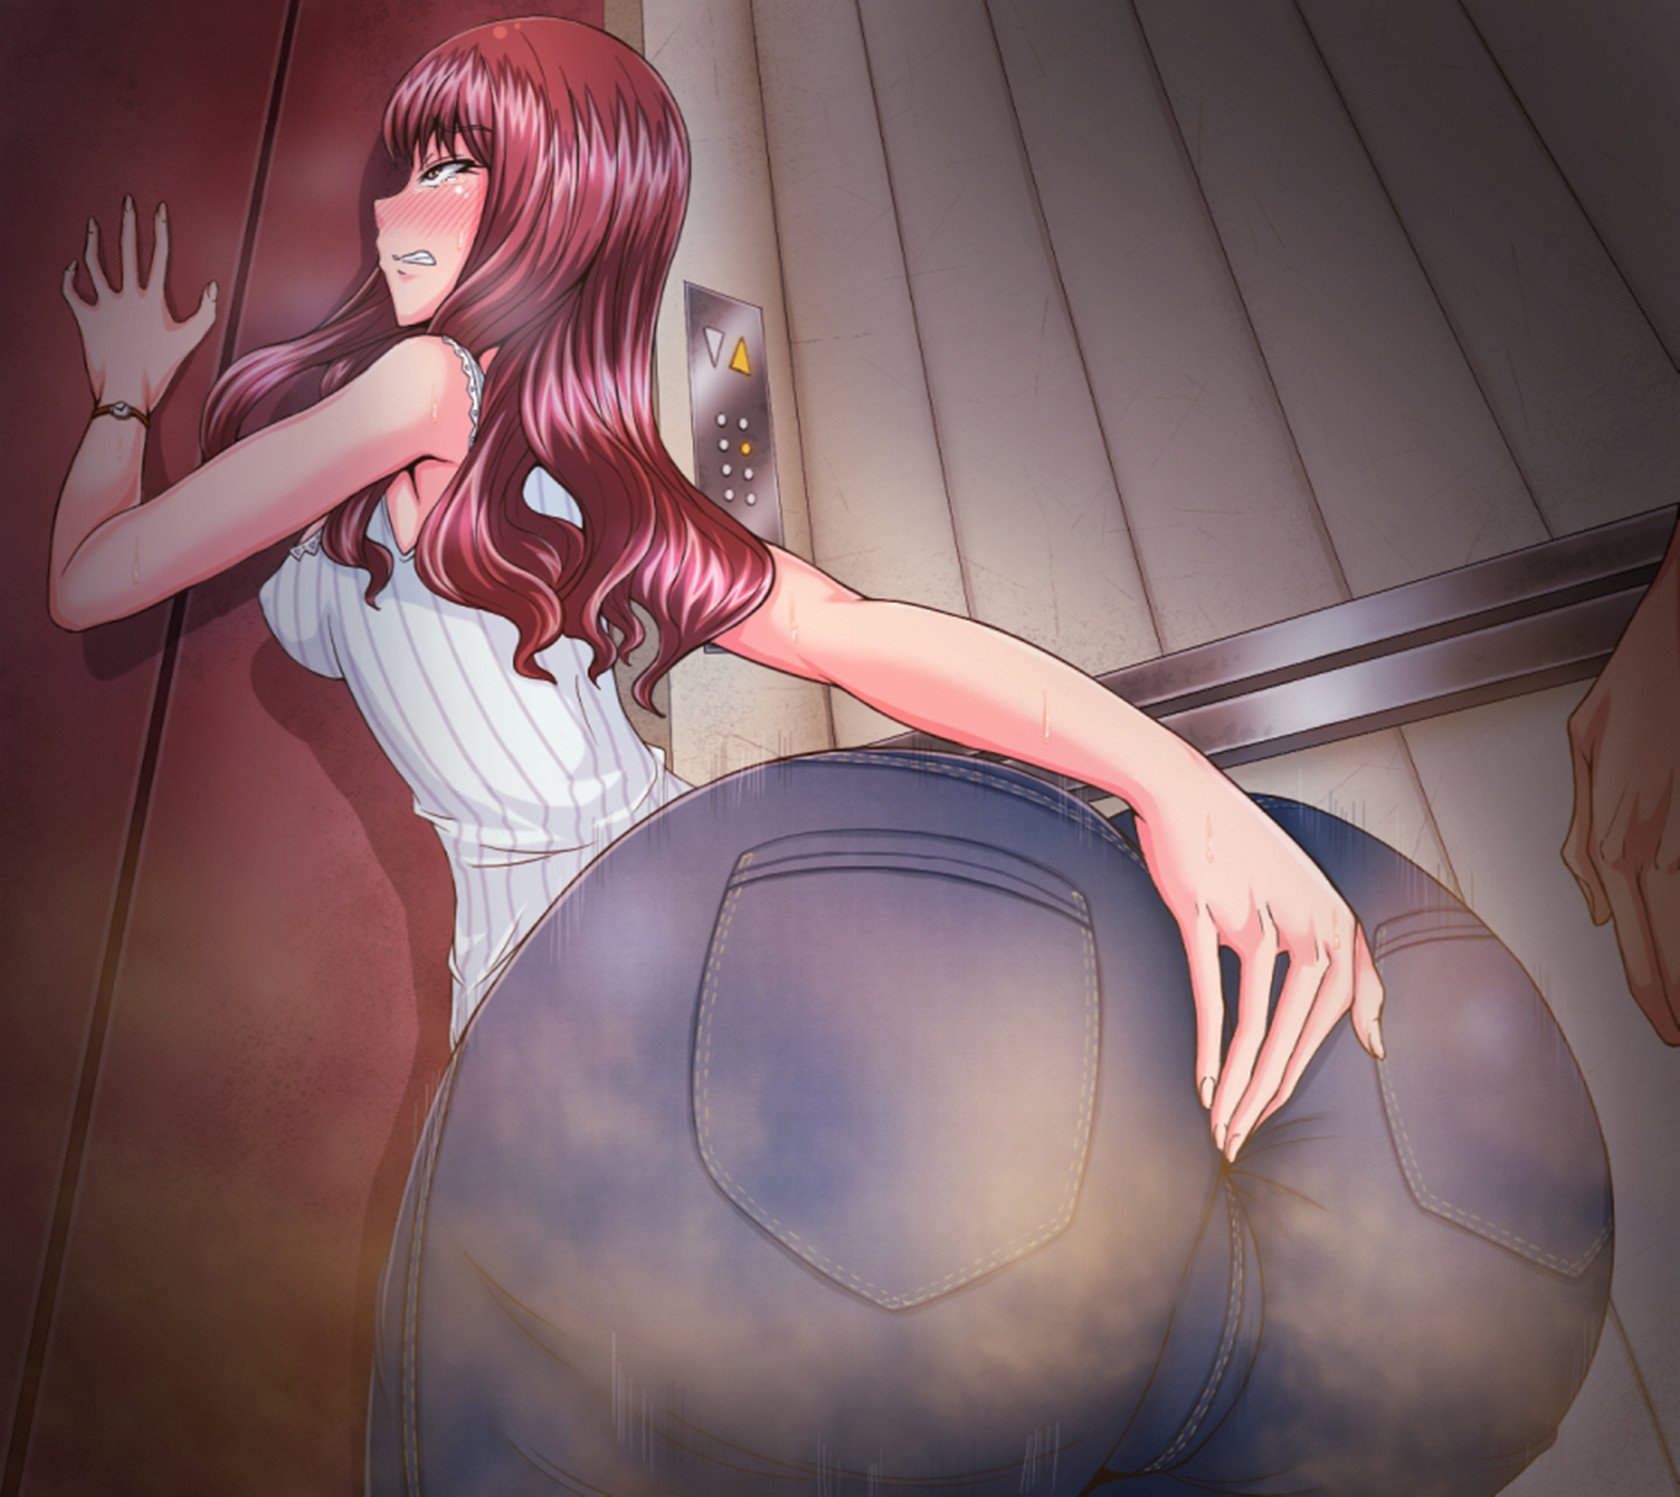 Girls Farting Porn